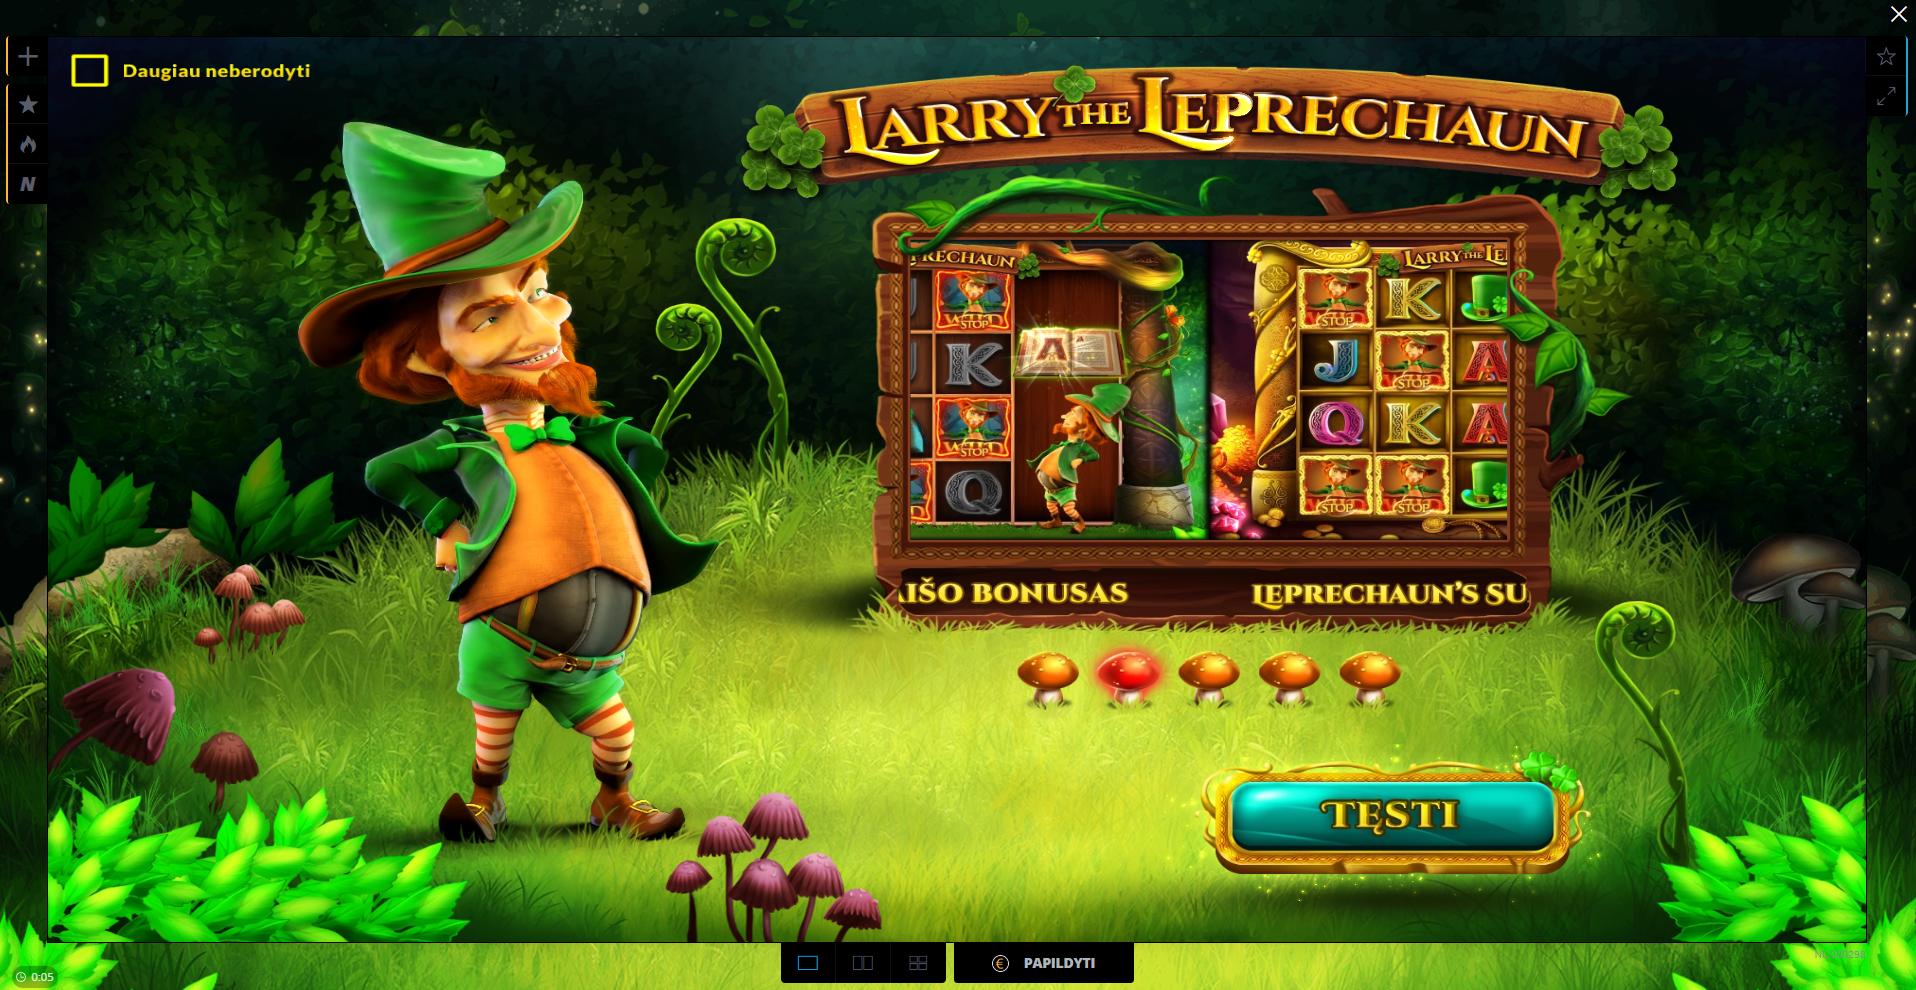 uniclubcasino larry the leprechaun wazdan